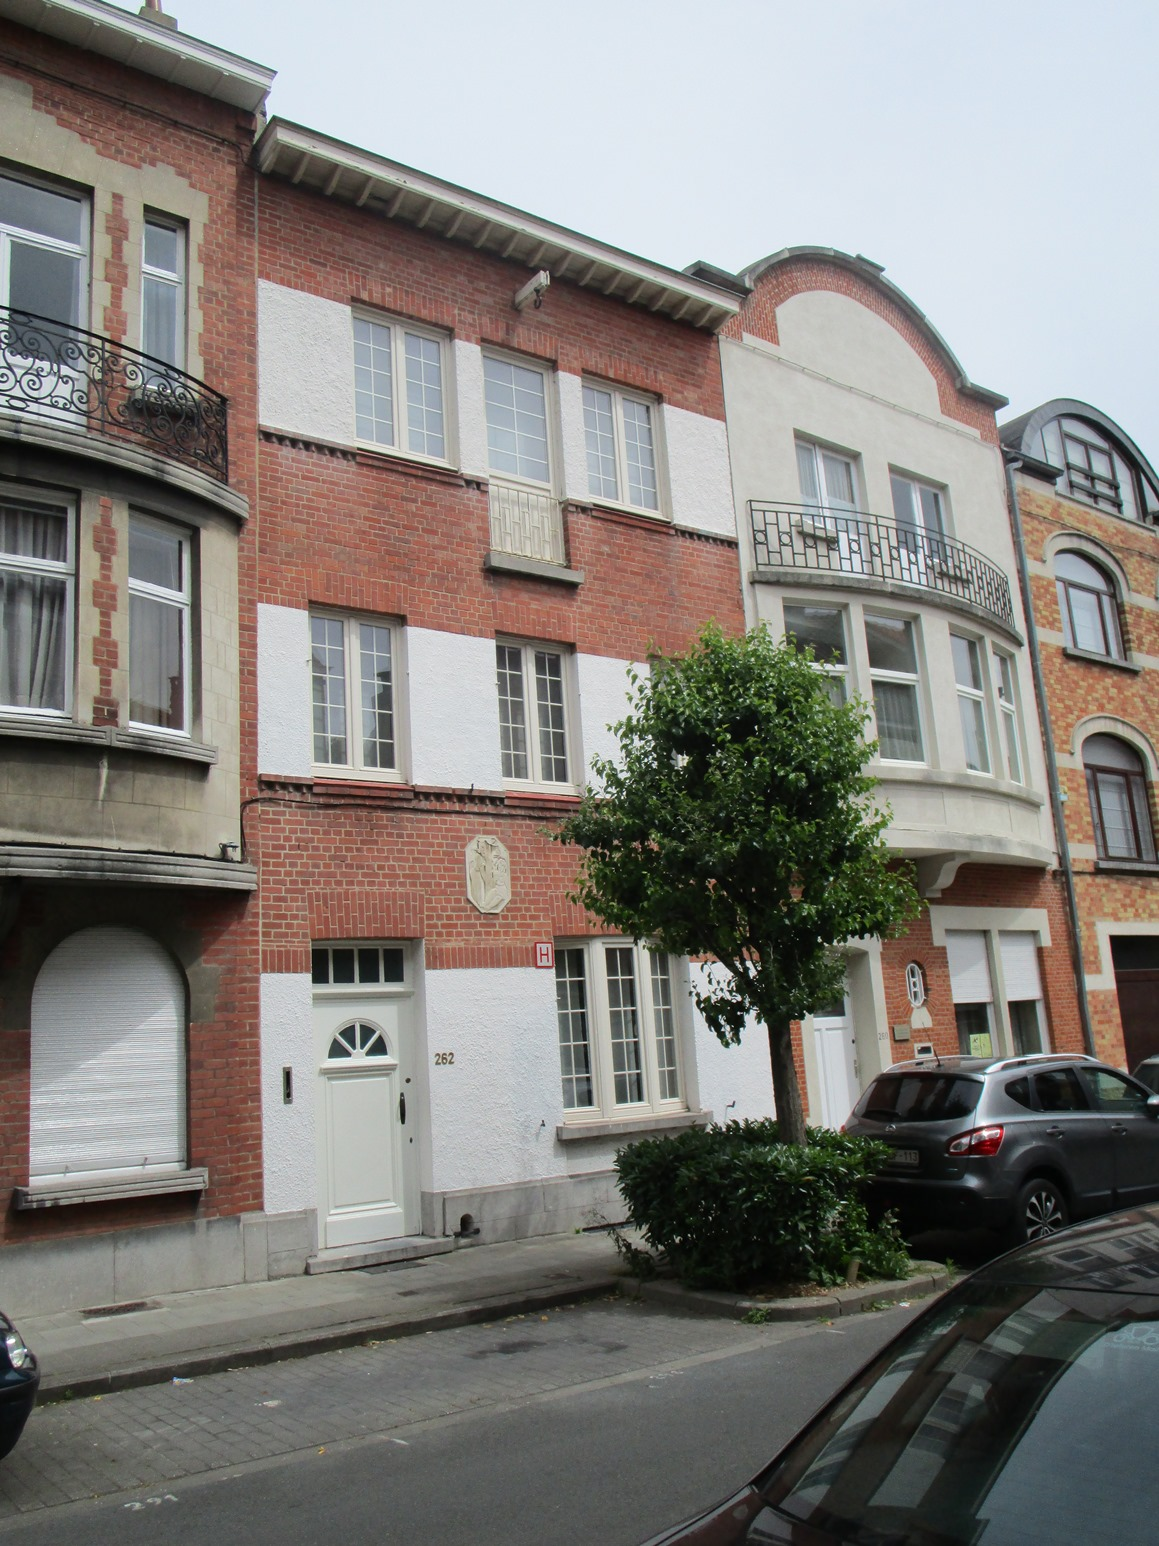 Woluwe-Saint-Lambert - Maison et atelier du peintre Edgard Tytgat ...